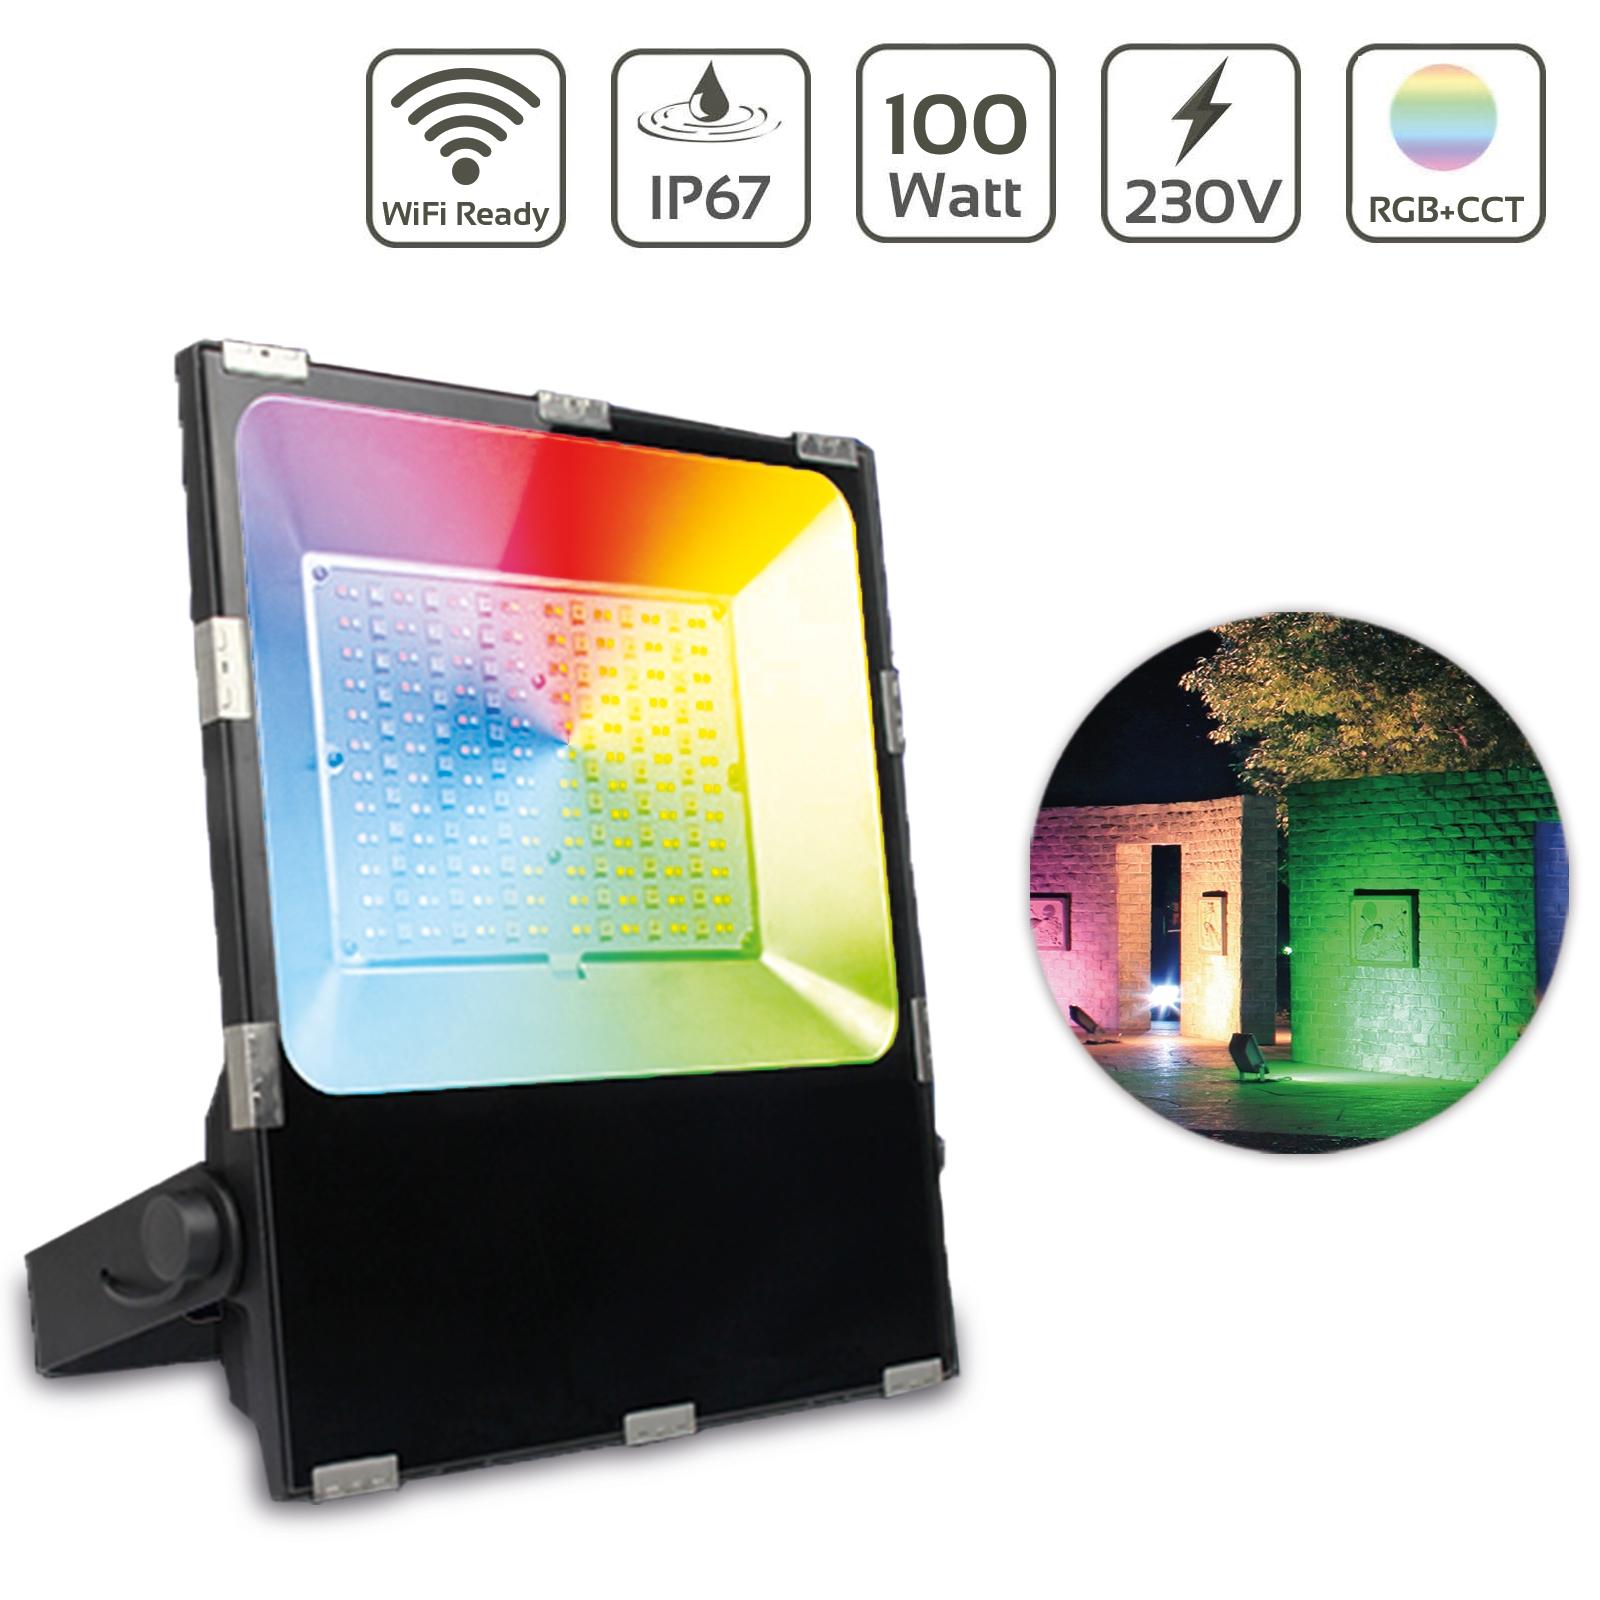 MiBoxer 100W RGB+CCT LED Außenstrahler WiFi Farbwechsel Fluter FUTT07